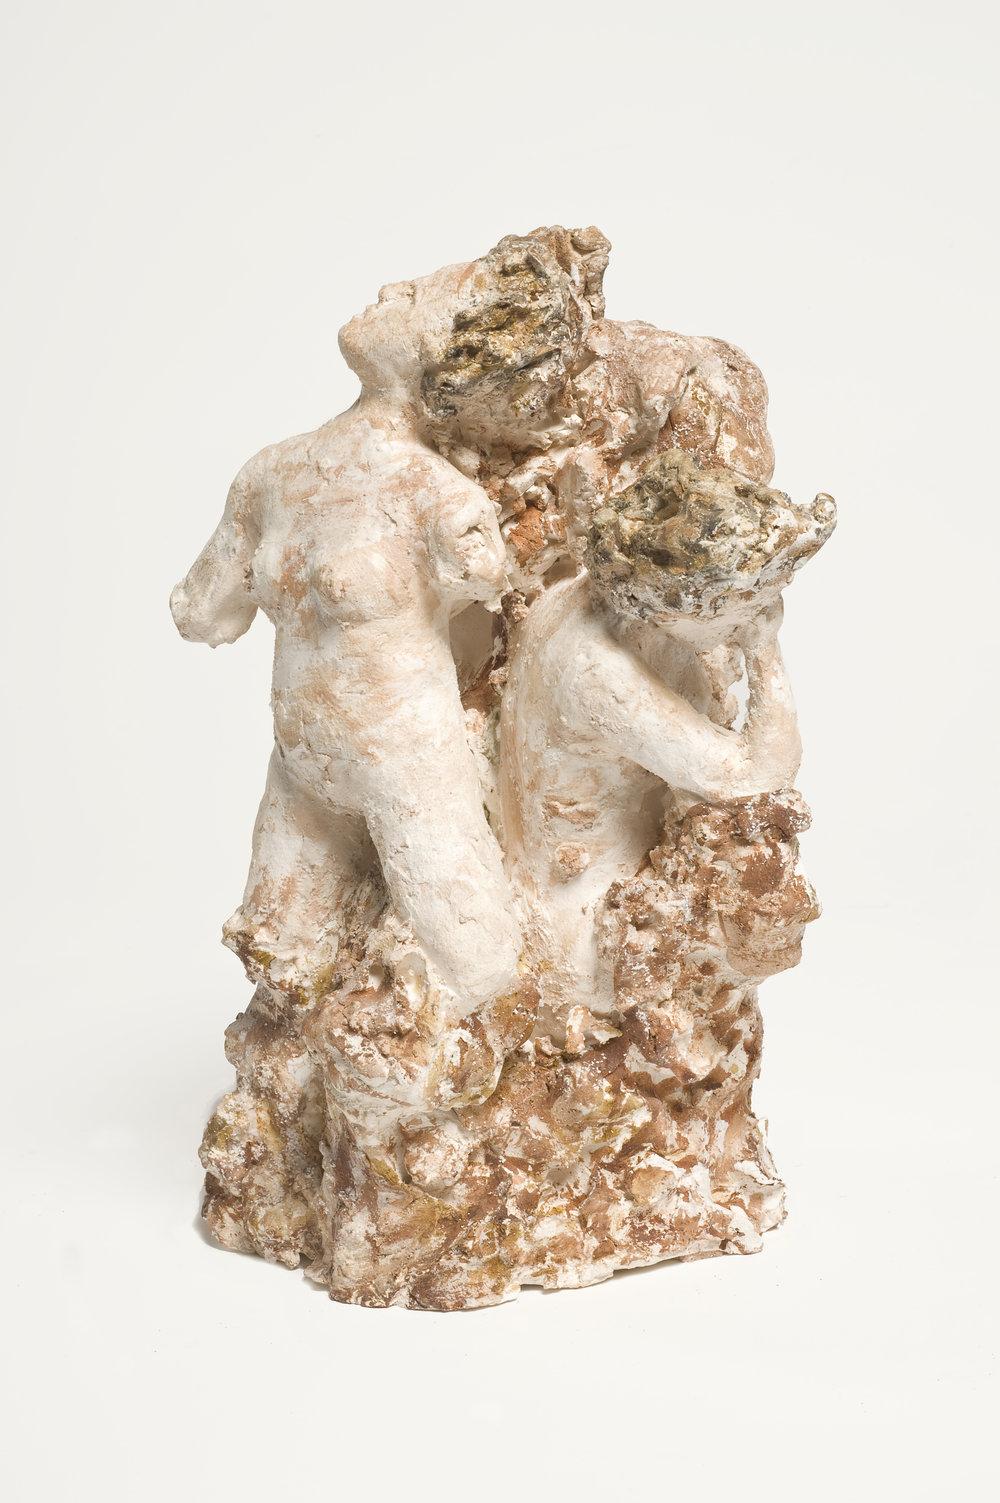 NAOMI ELLER  The Three Fates I  2012 Ceramic, oil paint, shellac and wax 29 ×26 ×18 cm